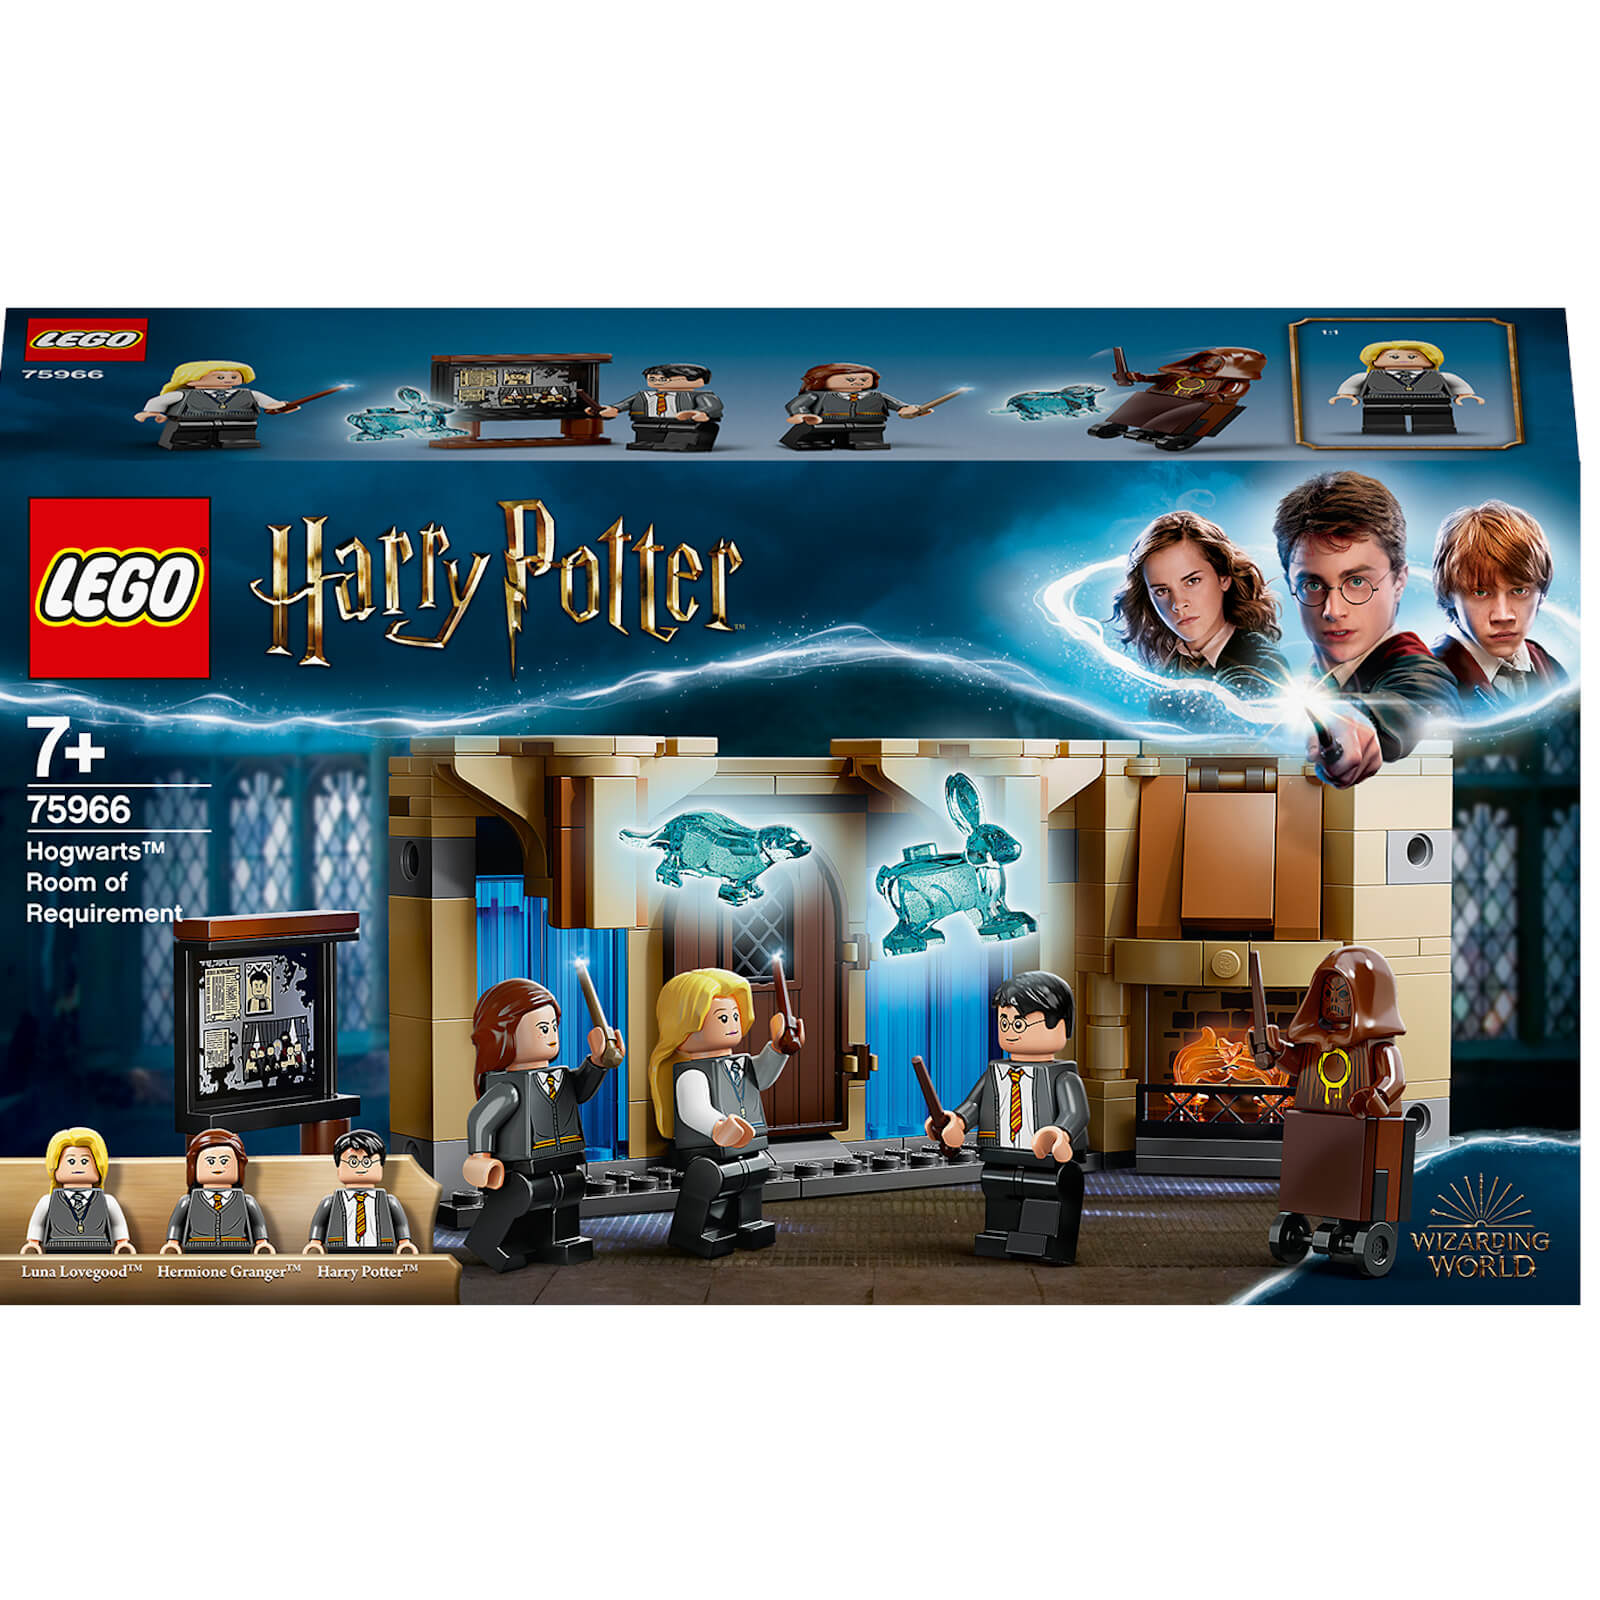 Image of LEGO Harry Potter: Hogwarts Room of Requirement Set (75966)